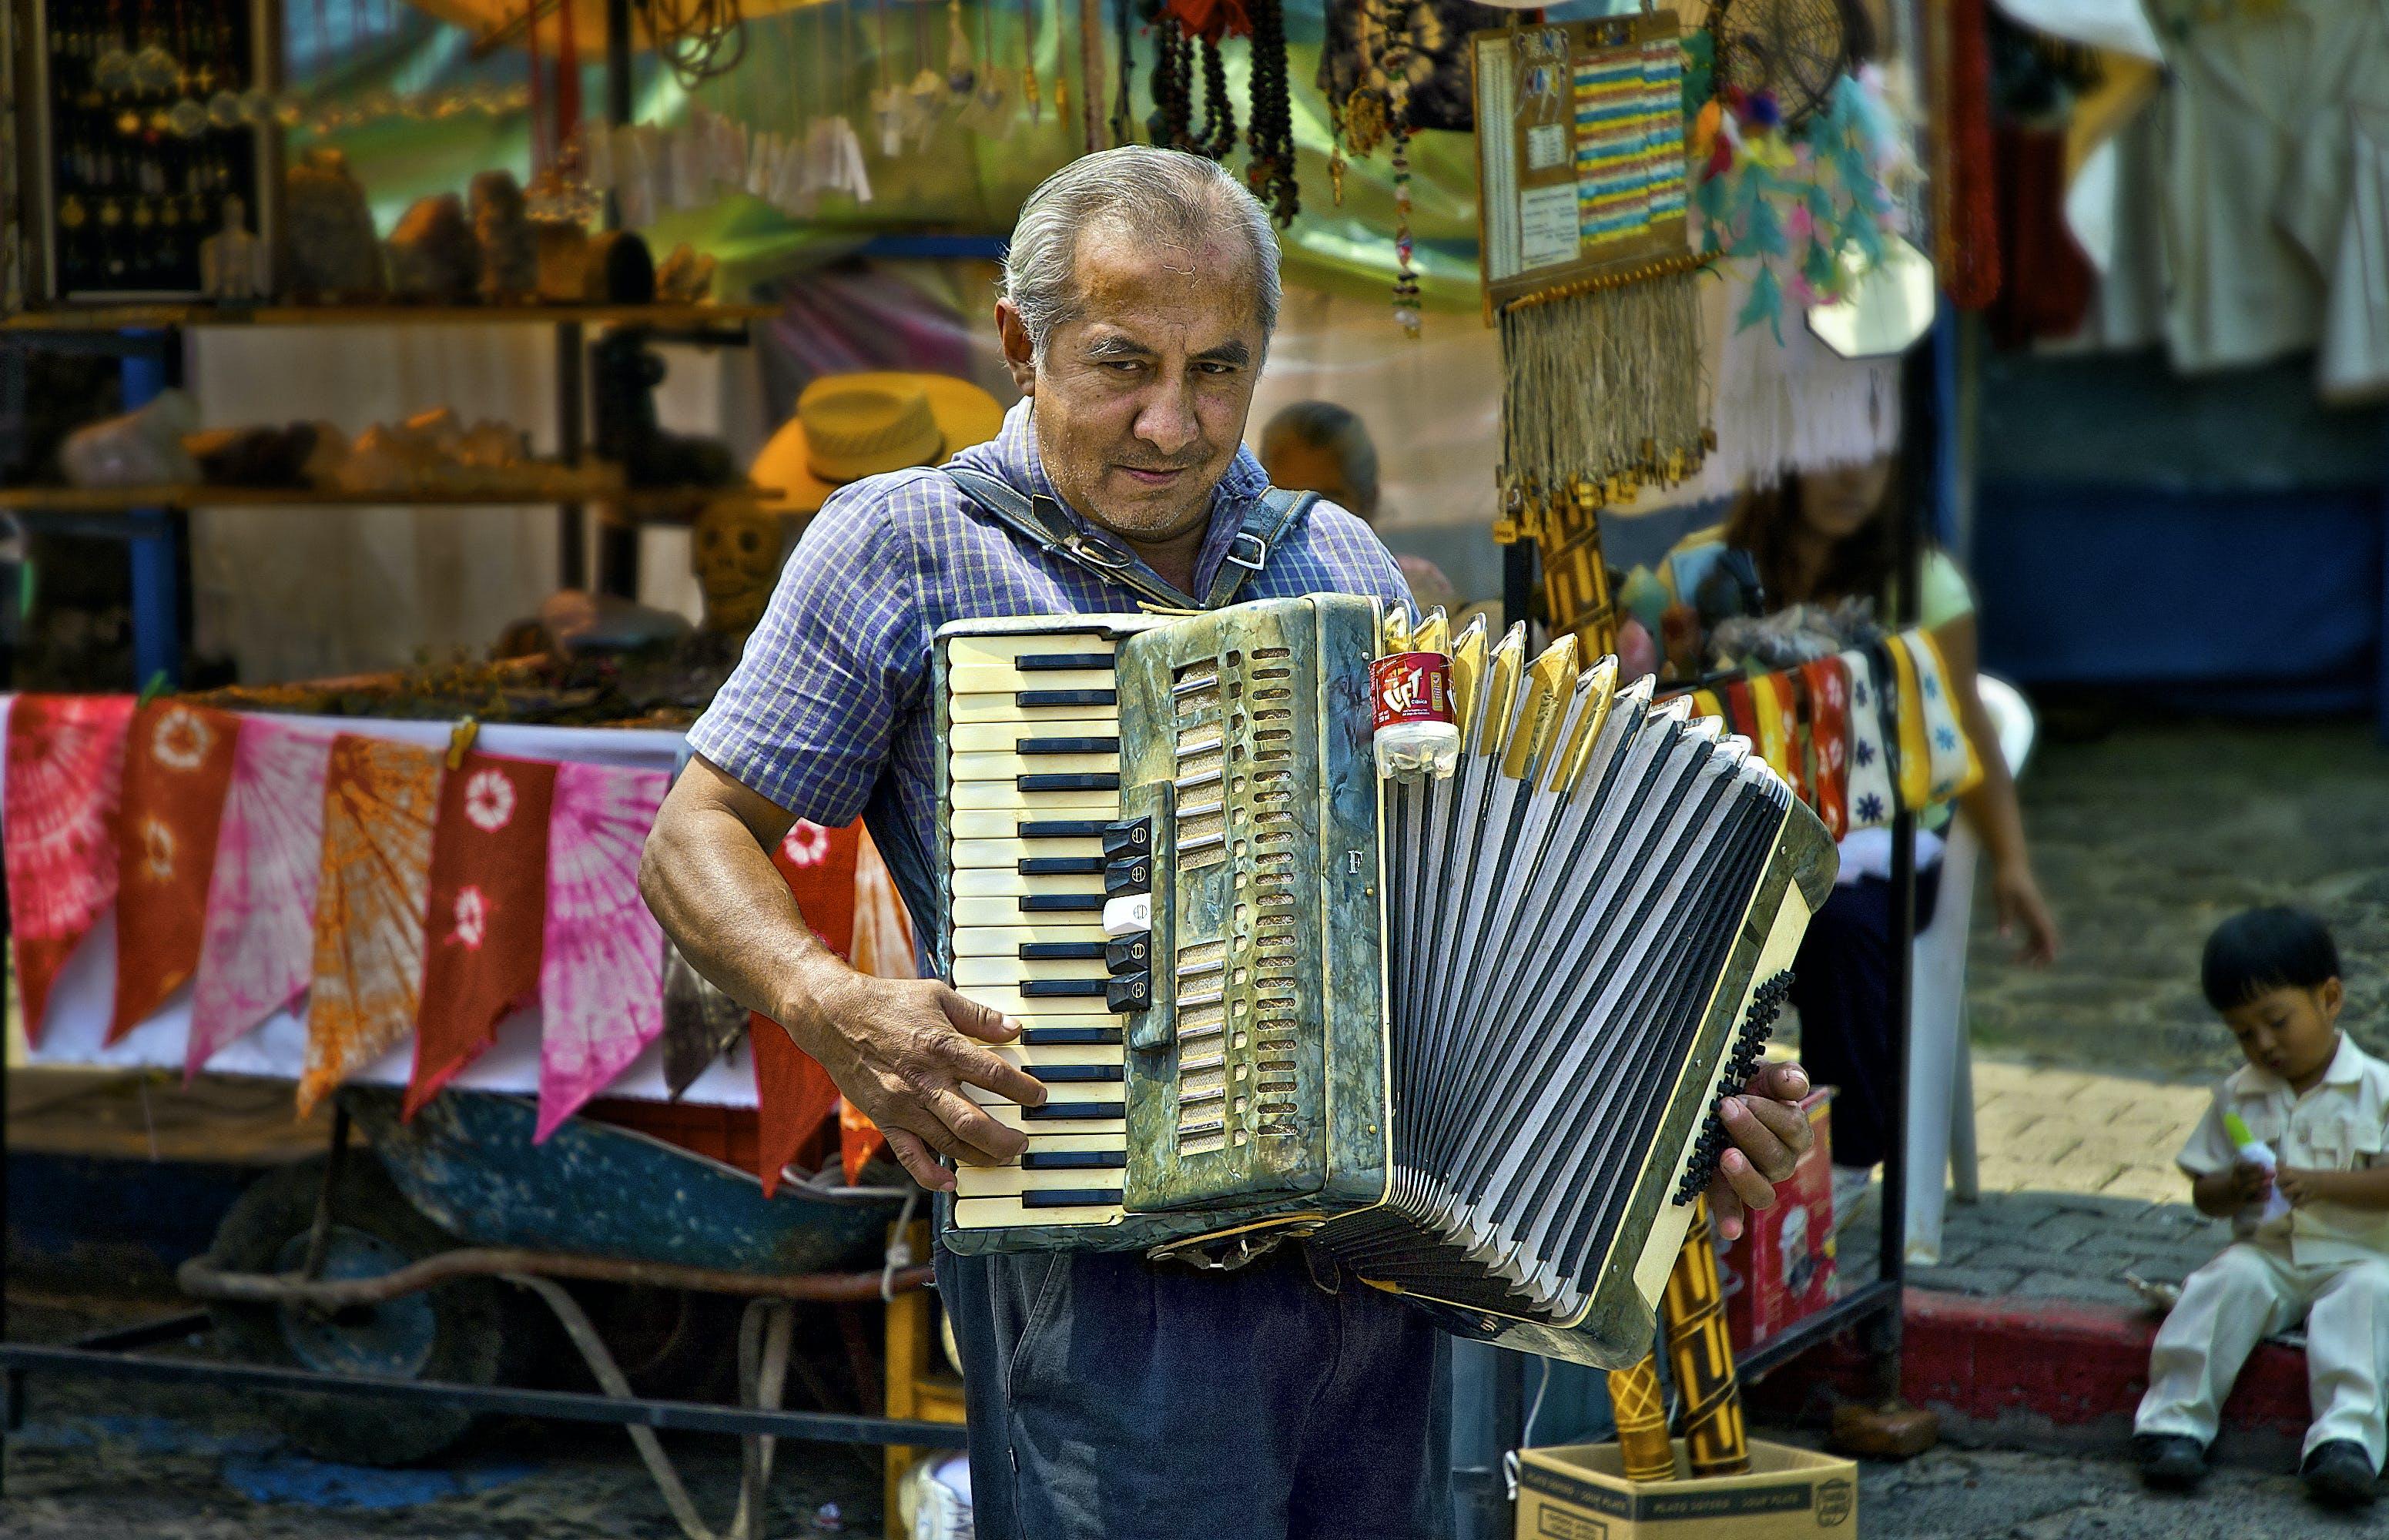 Free stock photo of accordion, musician, street artist